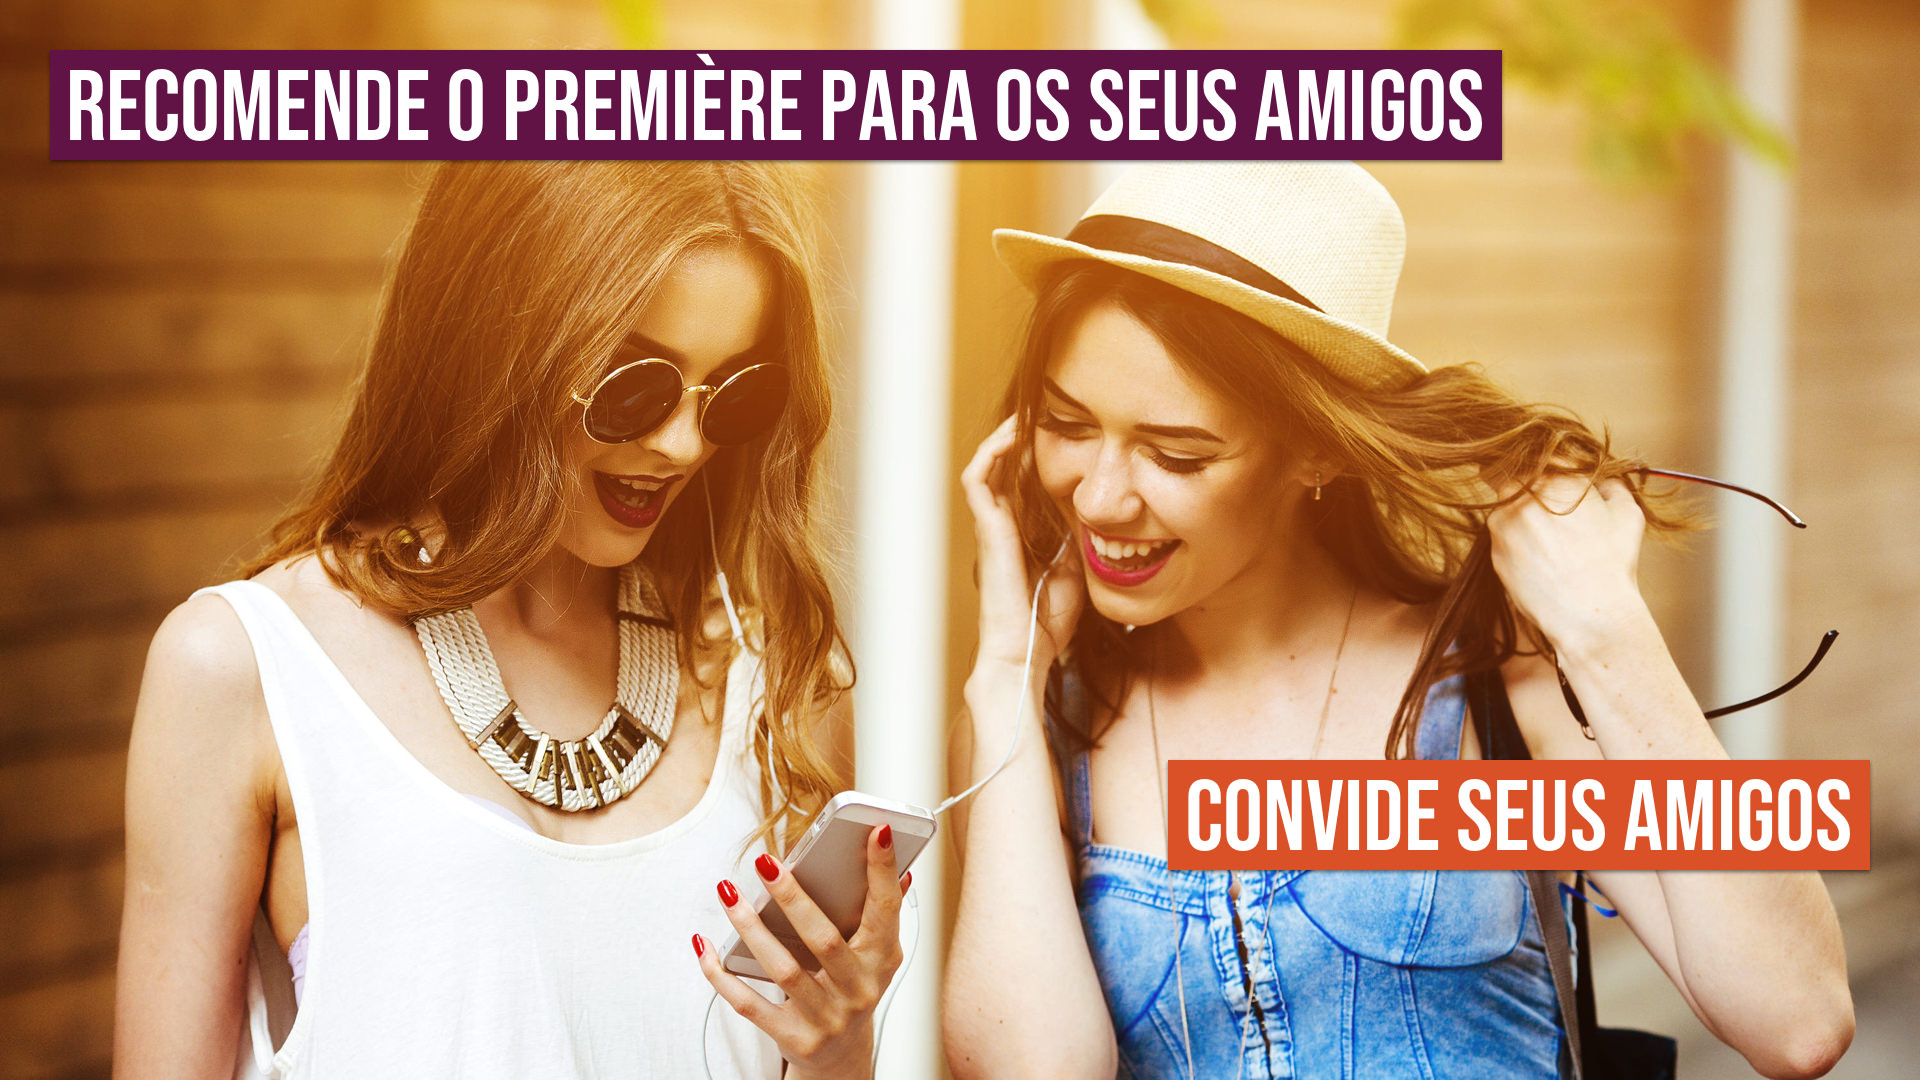 Recomende o Première para os seus amigos! Convide seus amigos!